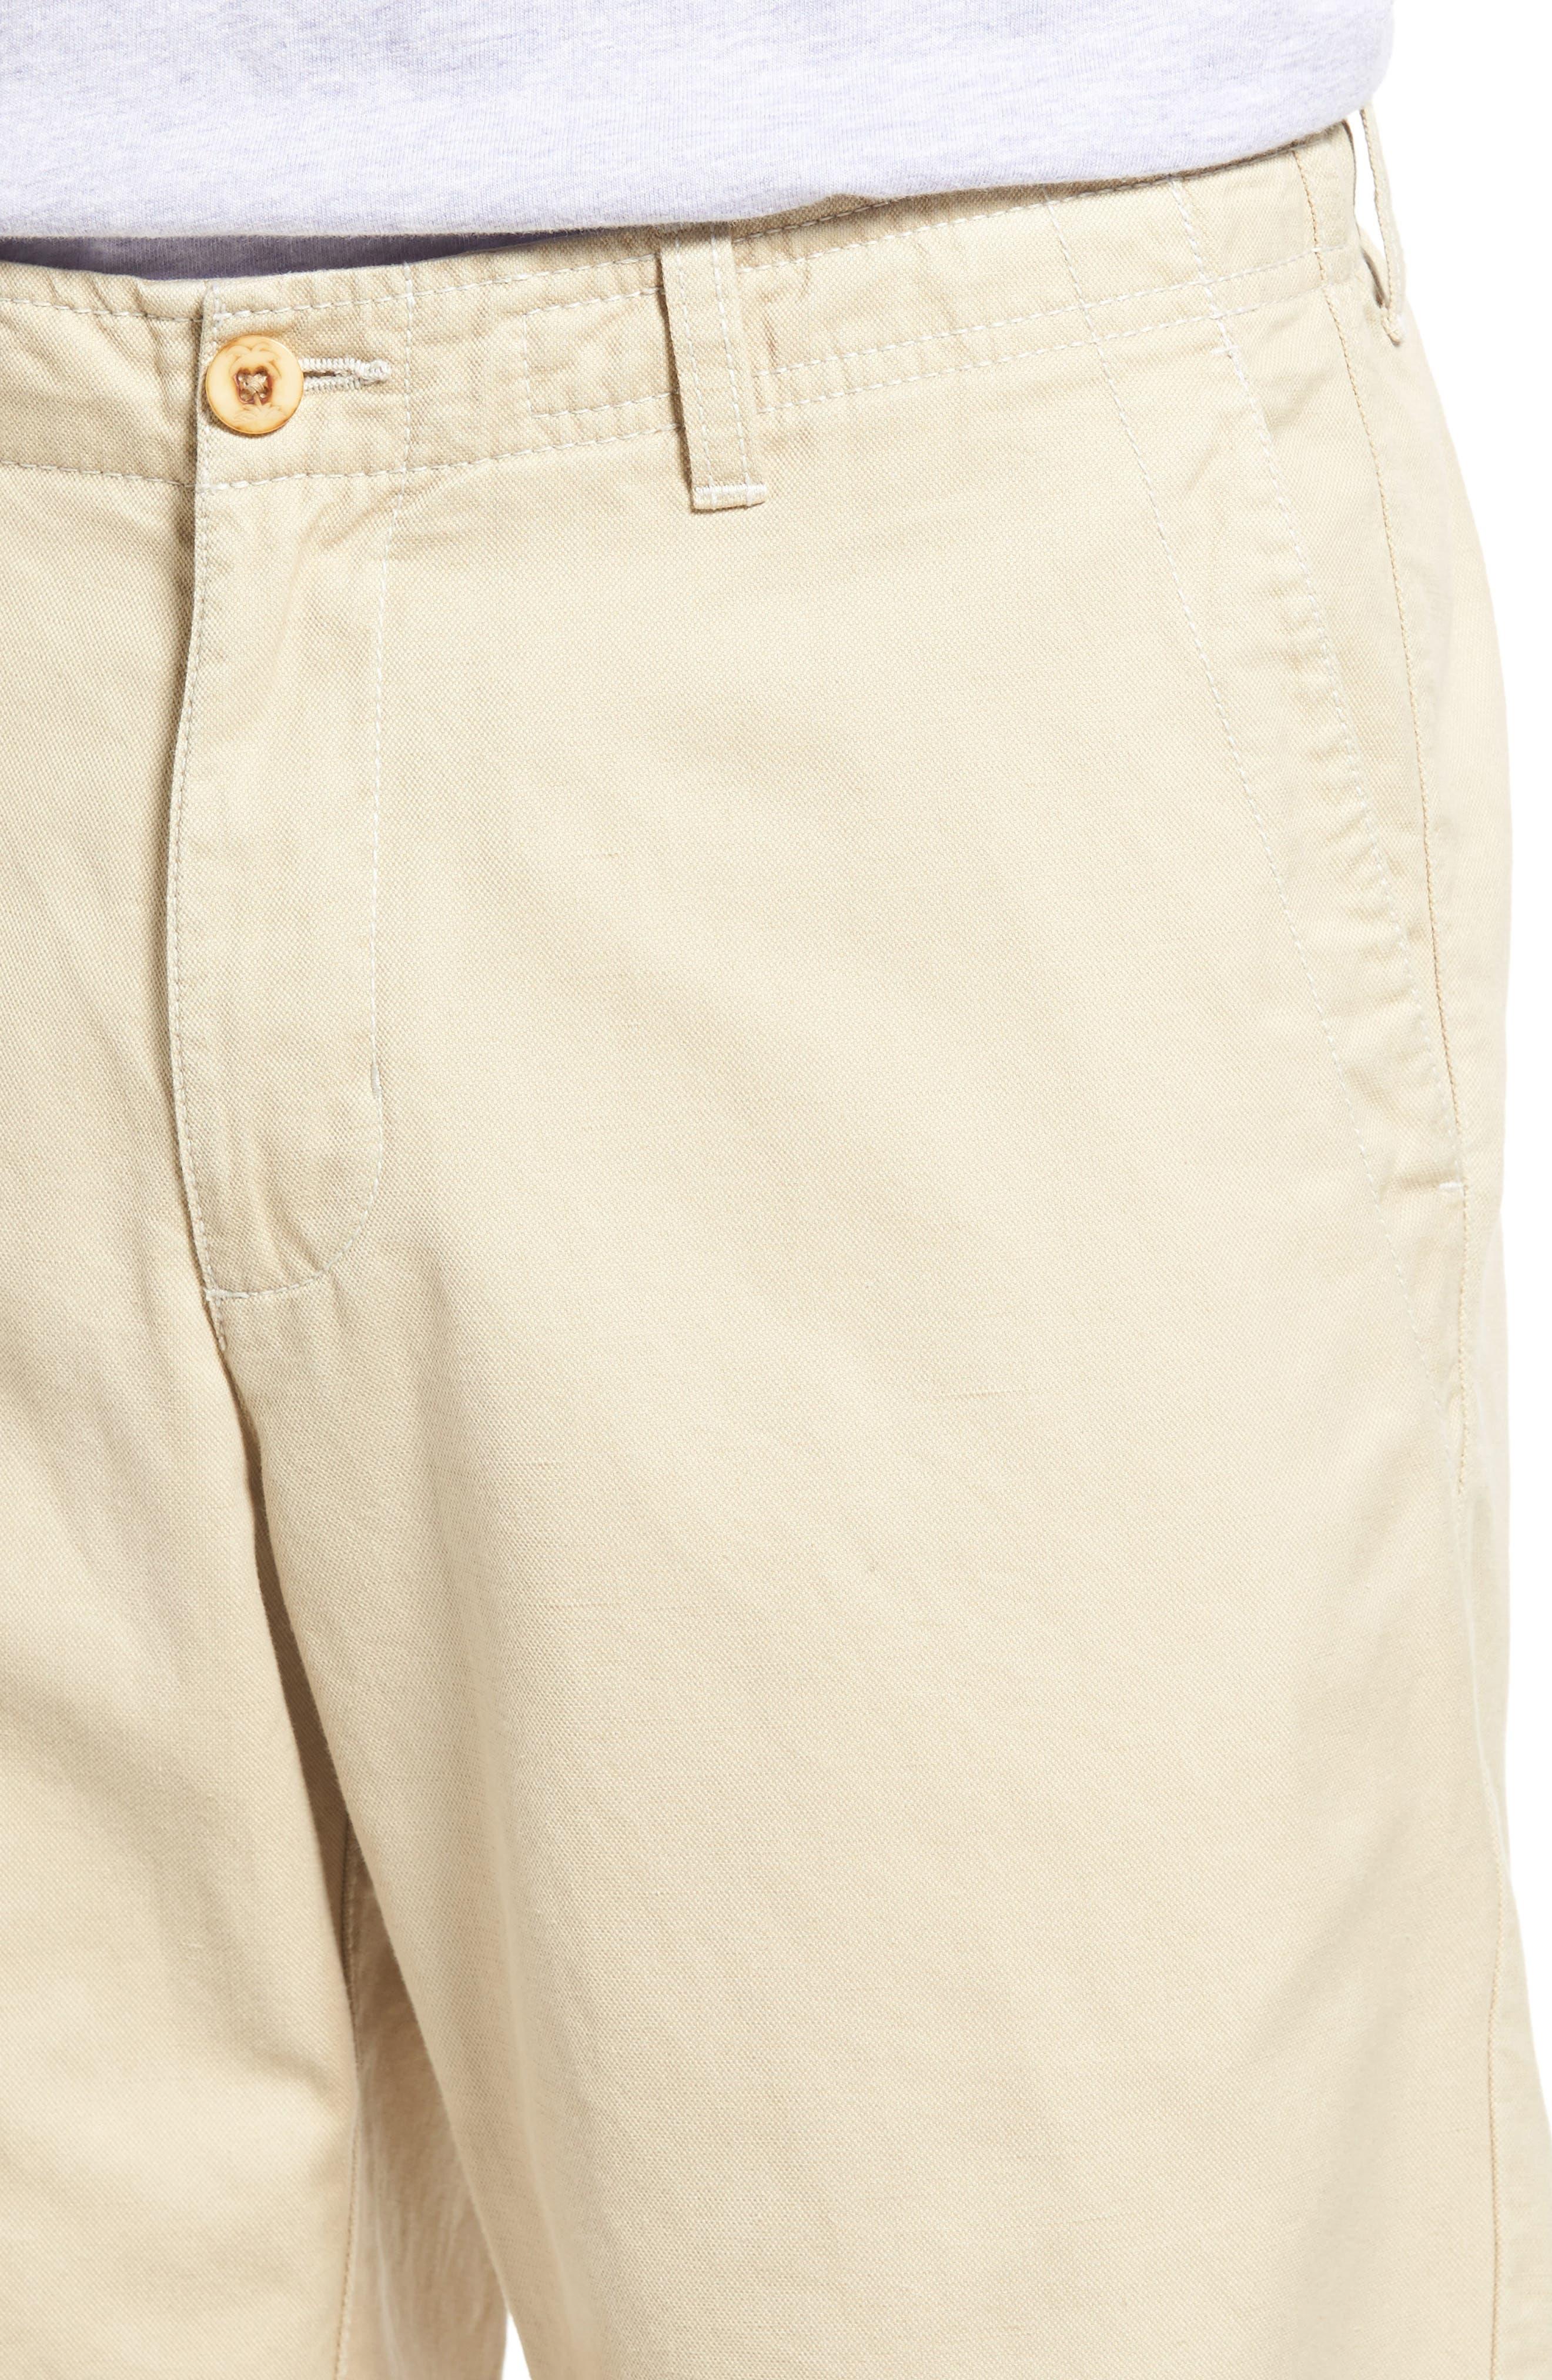 Aegean Lounger Shorts,                             Alternate thumbnail 4, color,                             200